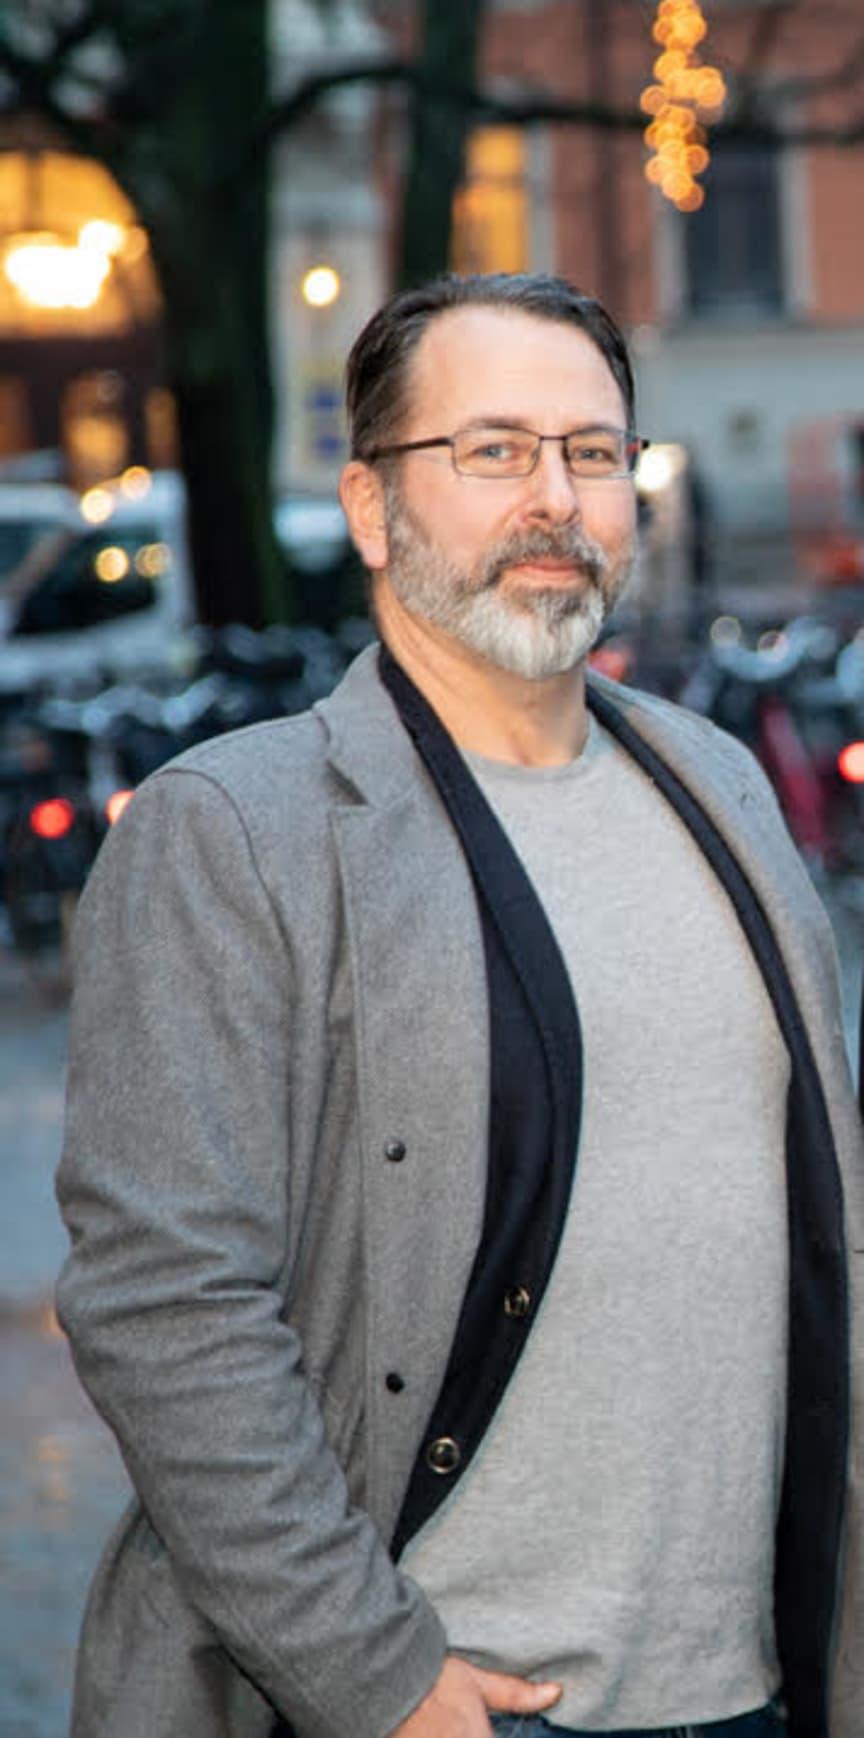 Jimmy Eriksson, VD/CEO Sisyfos Digital AB